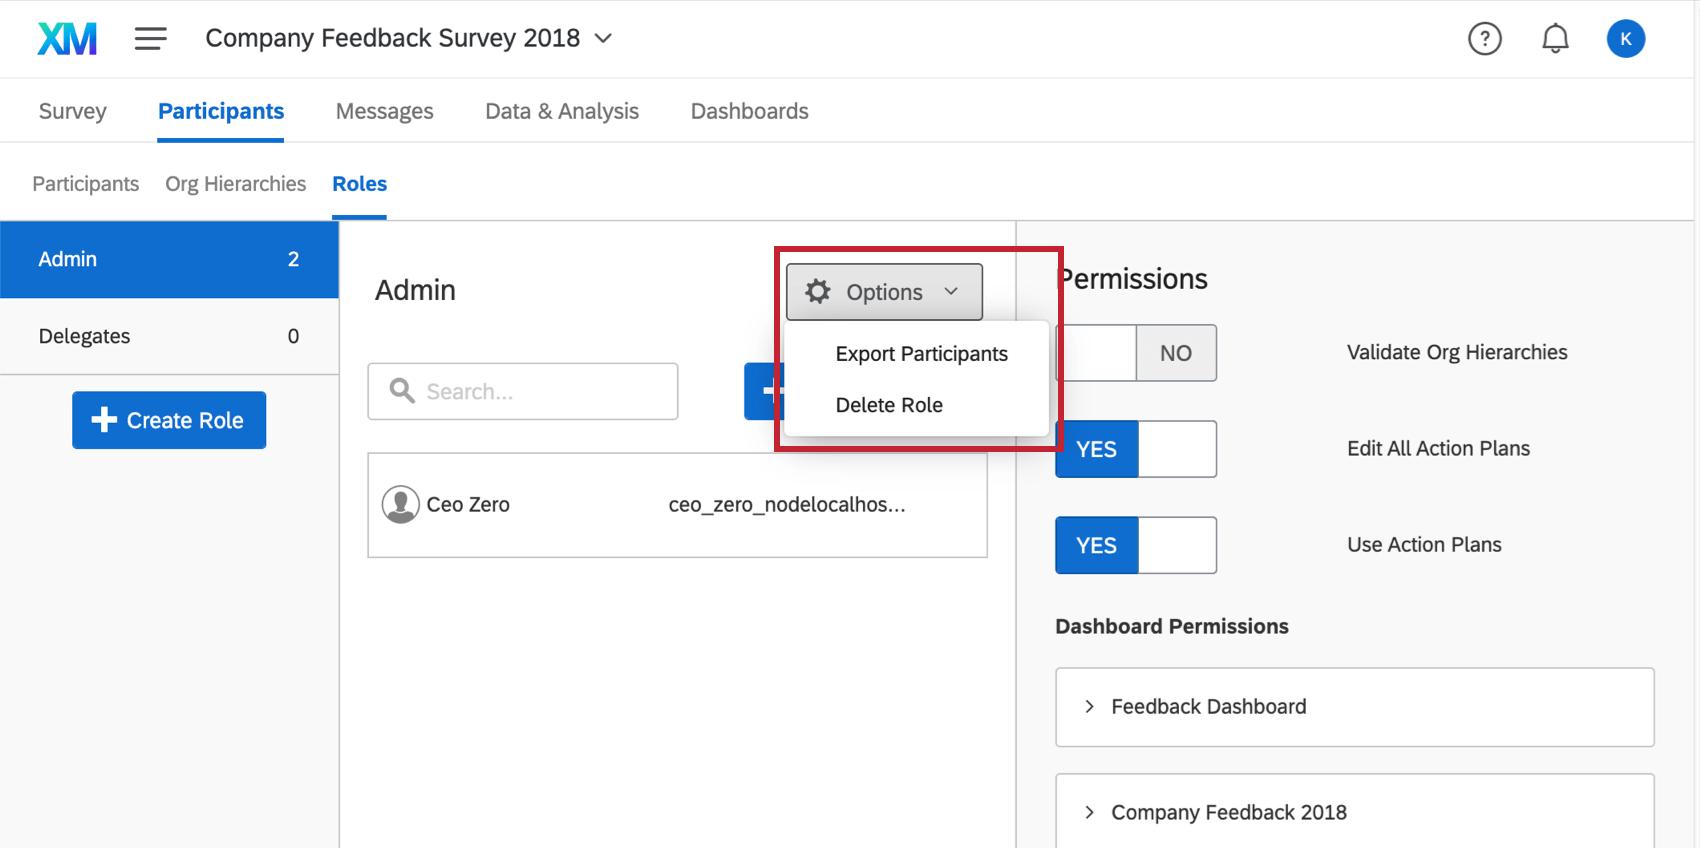 Options button inside a role